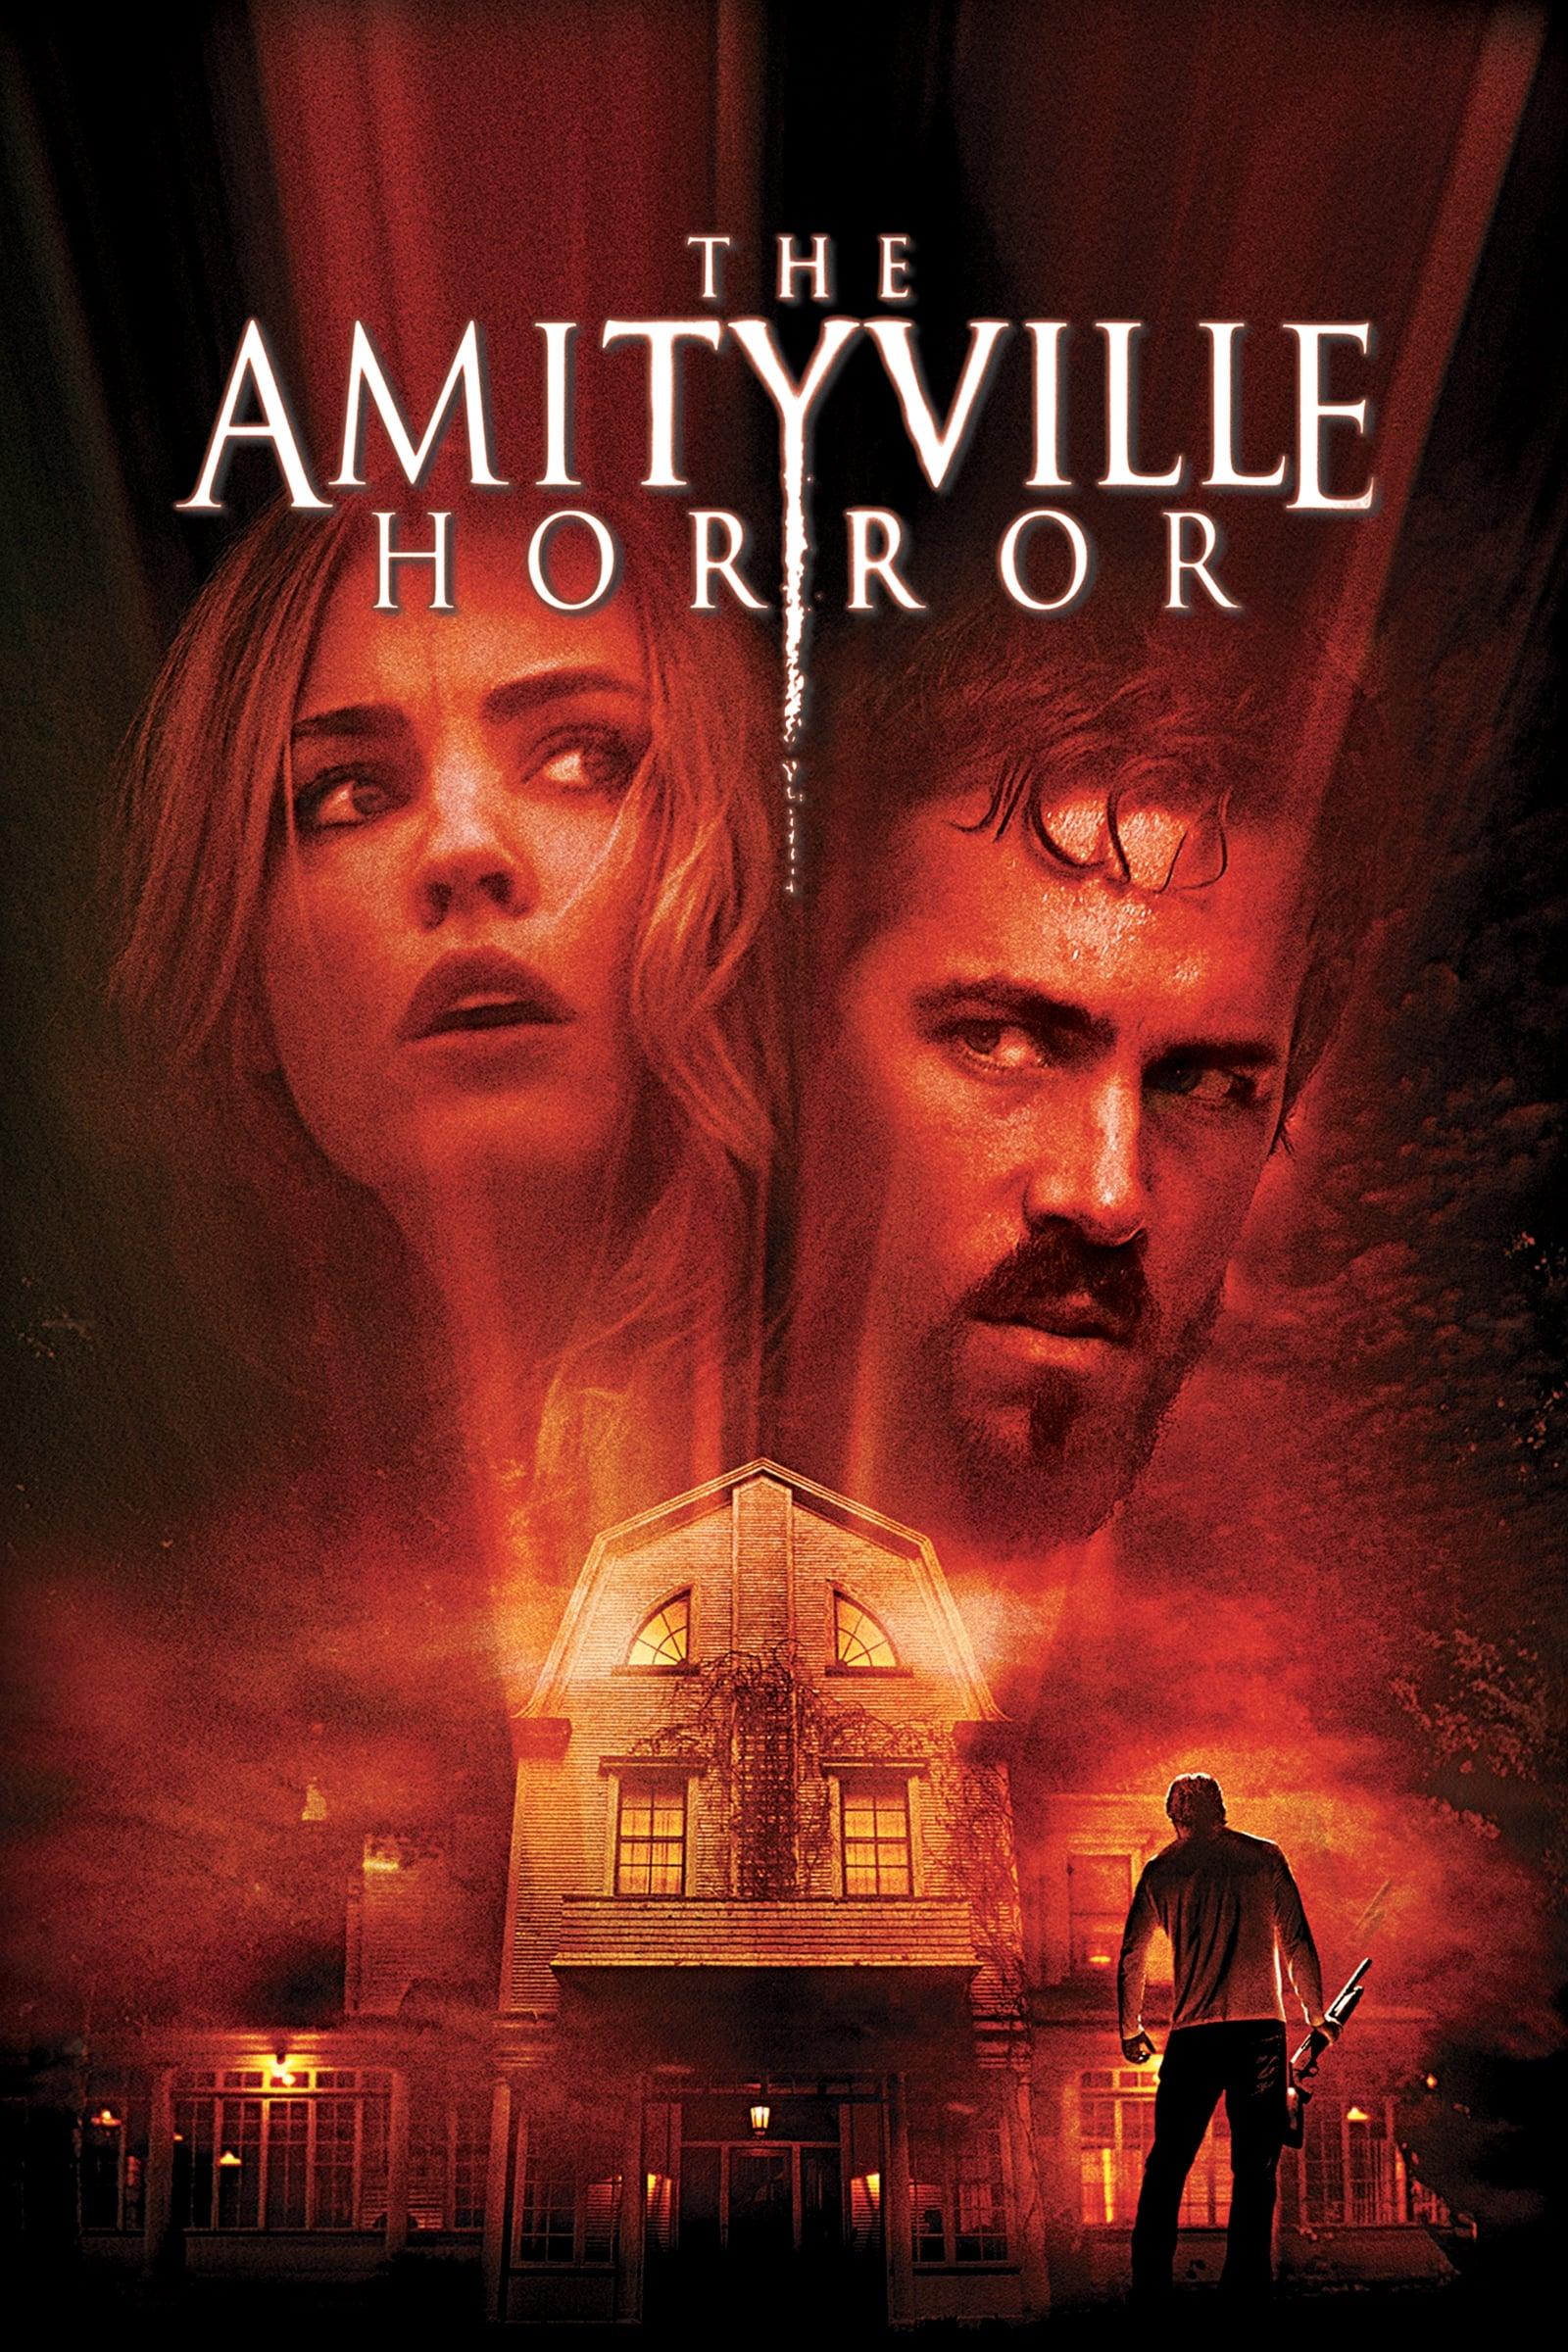 Amityville - A Mansão do Diabo